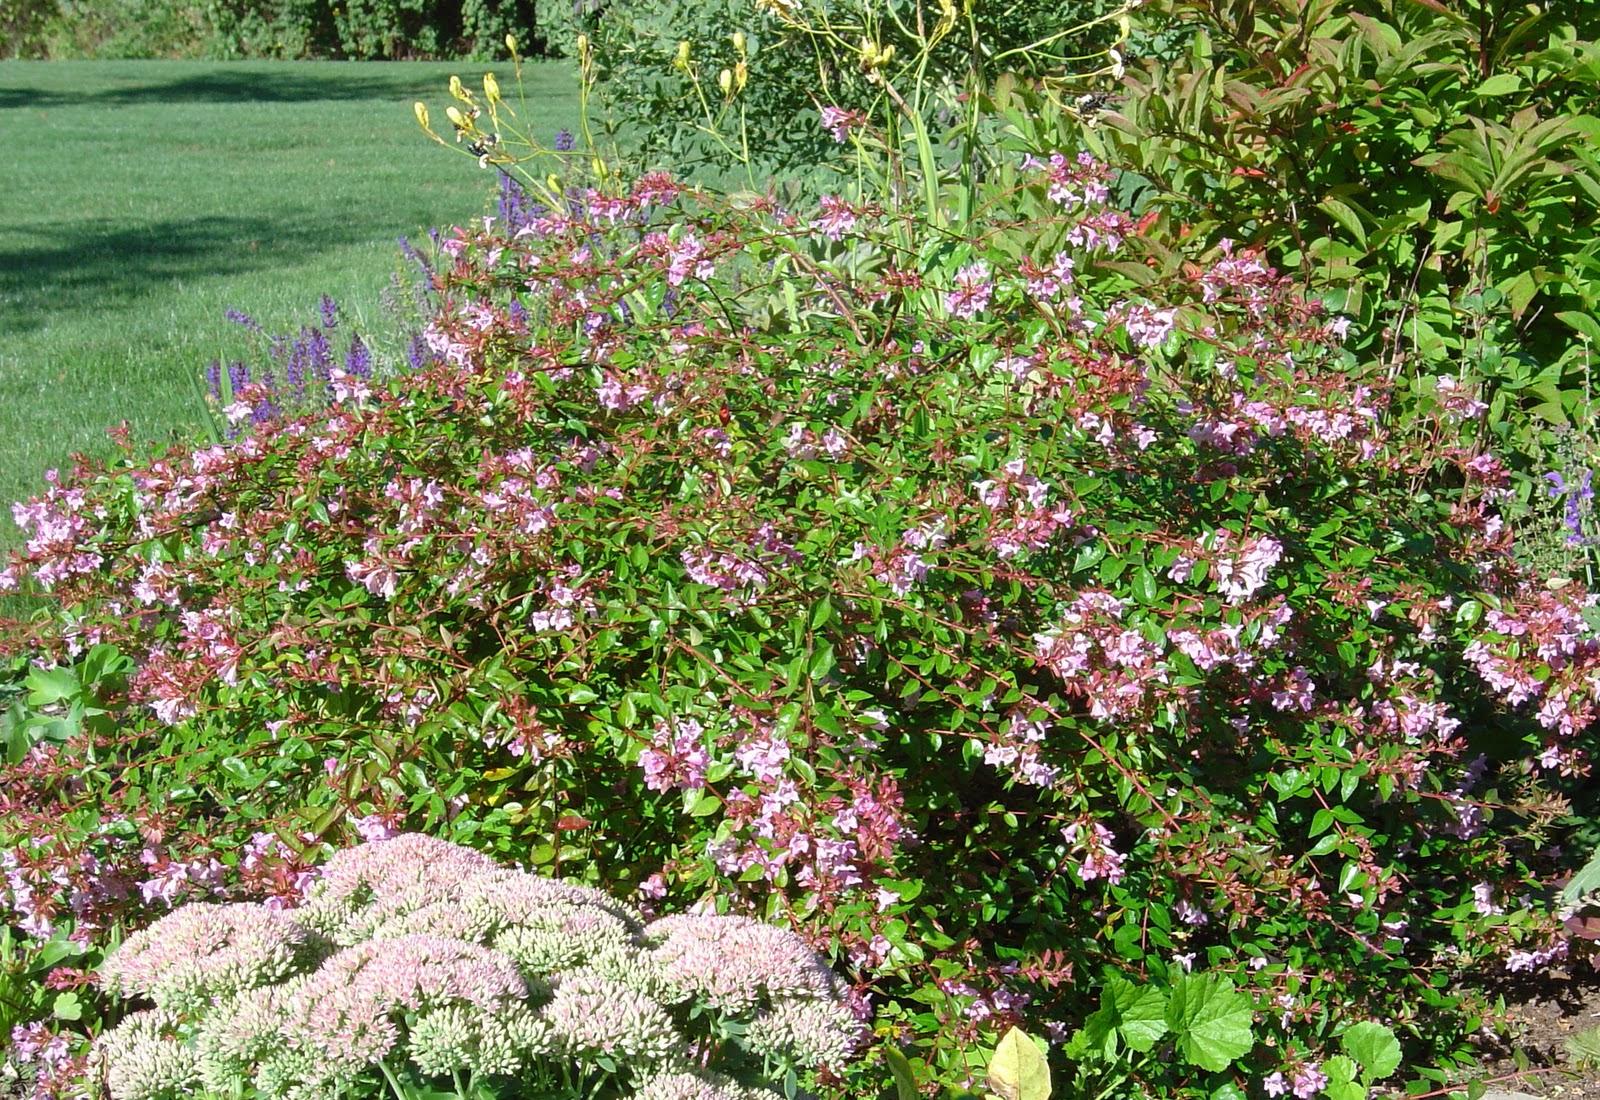 plant inventory at 20 timothy abelia x grandiflora glossy abelia. Black Bedroom Furniture Sets. Home Design Ideas